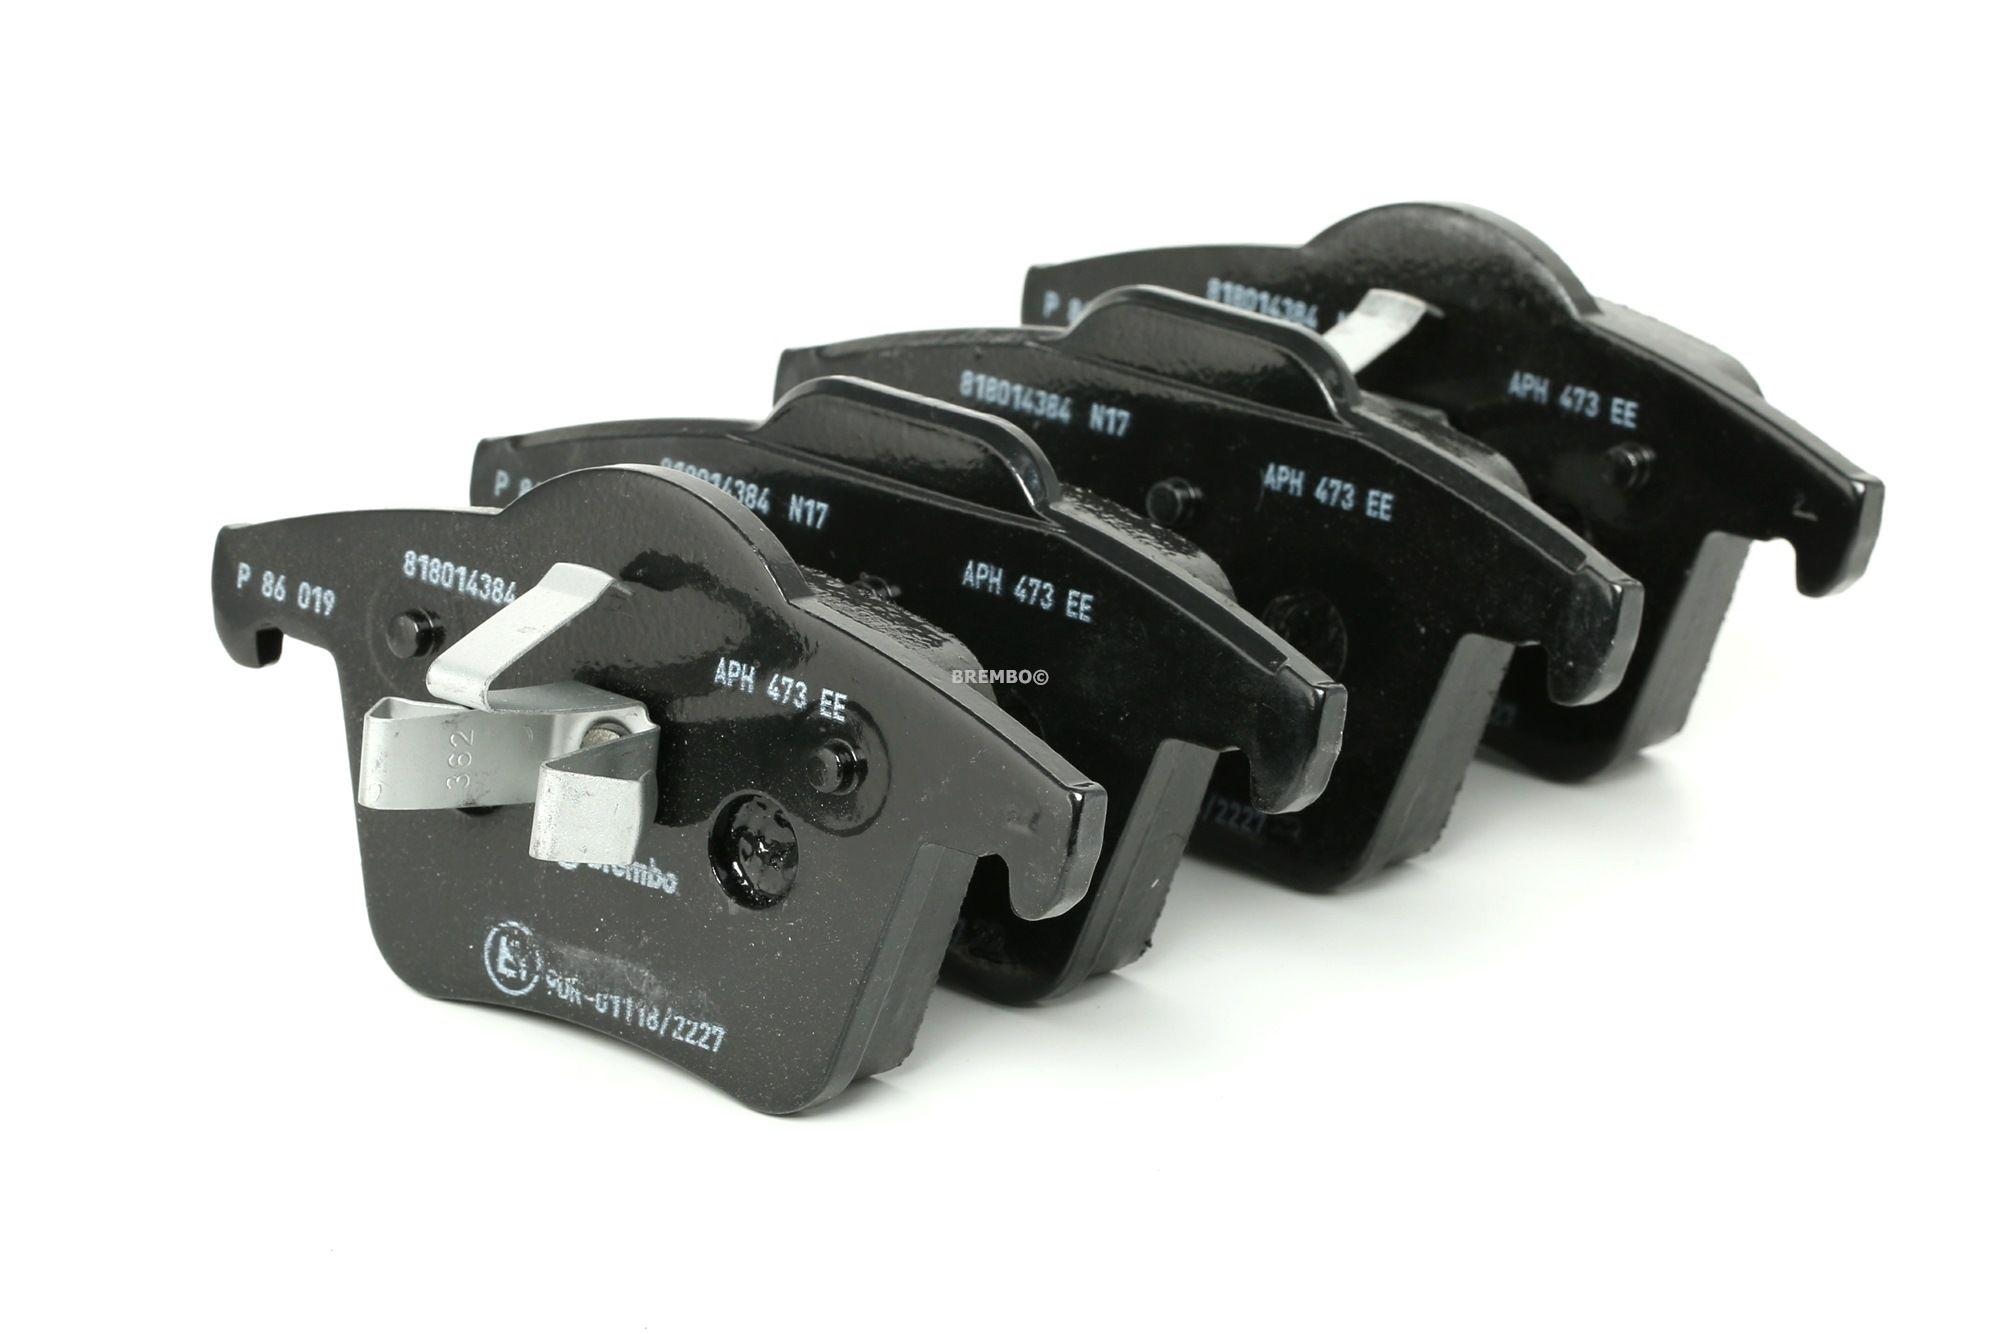 Disk brake pads BREMBO D9807883 rating